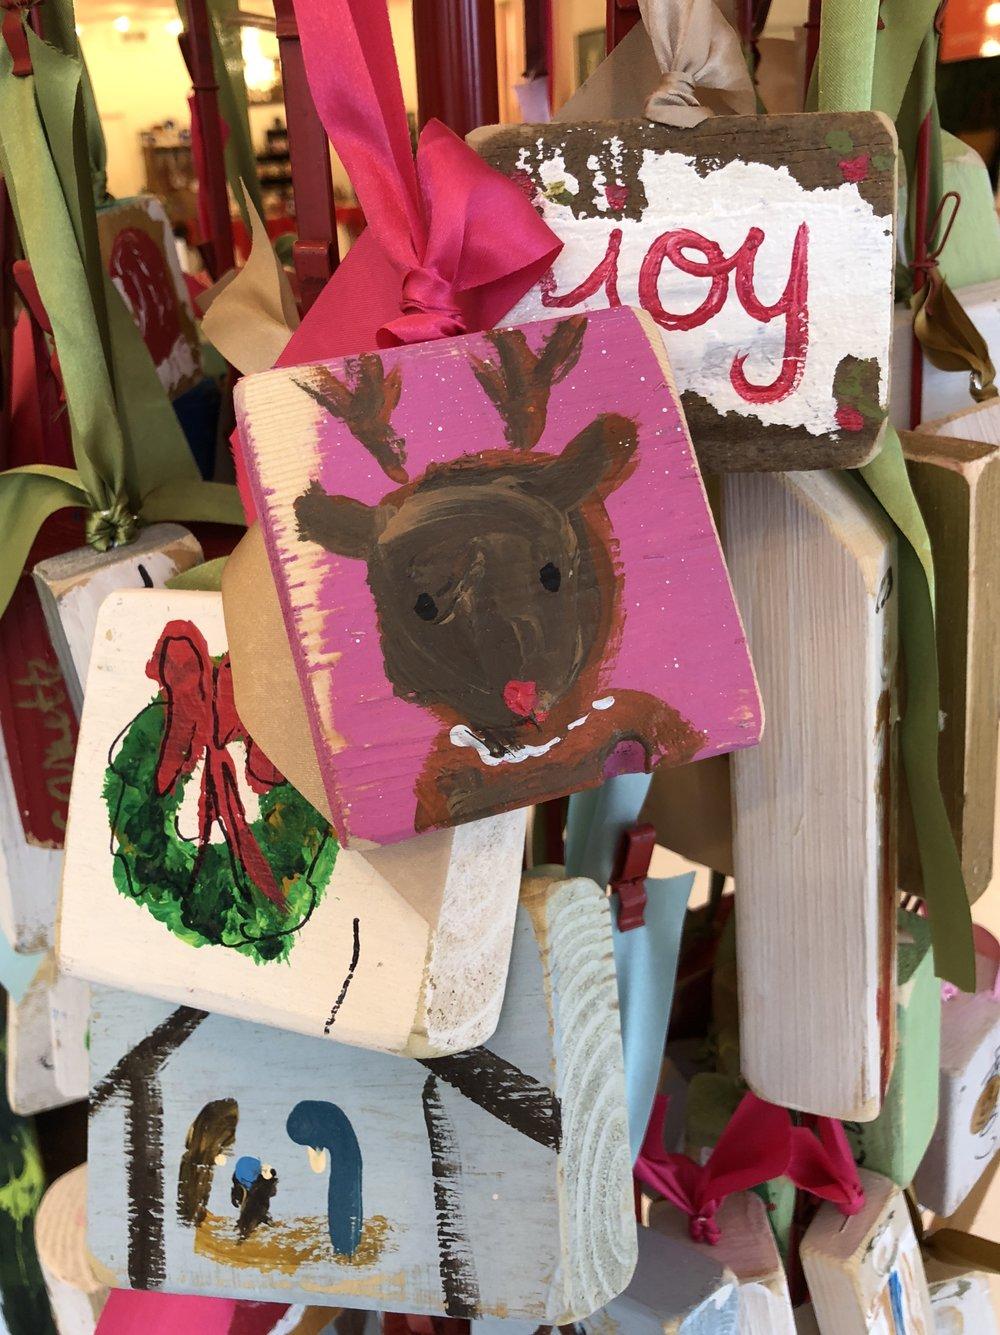 Ornaments by Christi Arnette